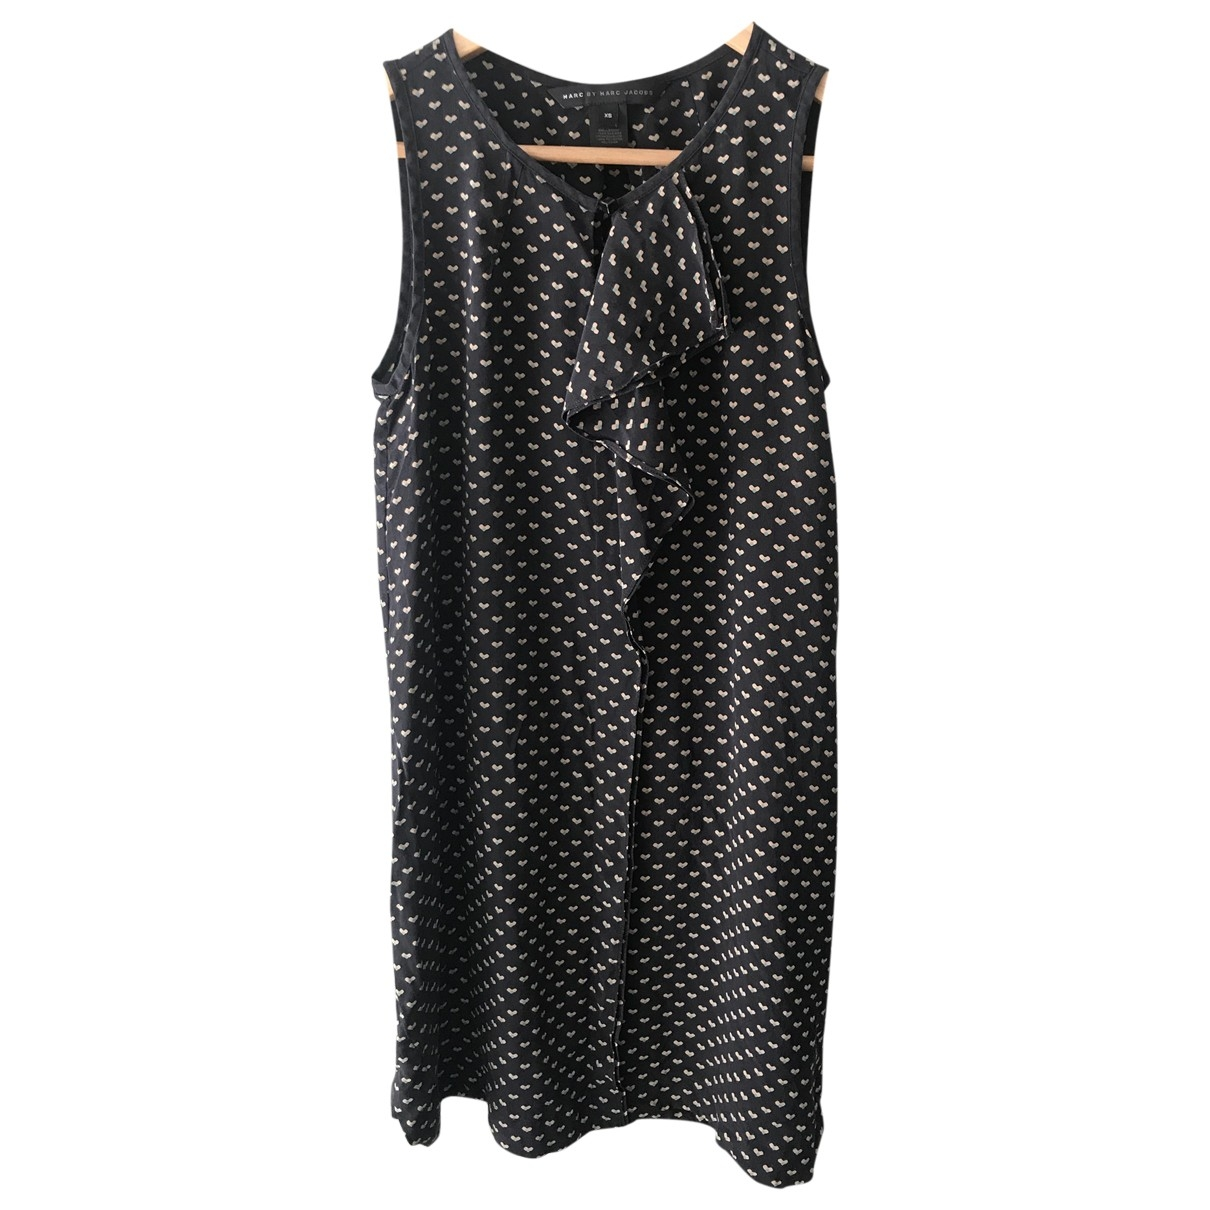 Marc By Marc Jacobs \N Silk dress for Women XS International